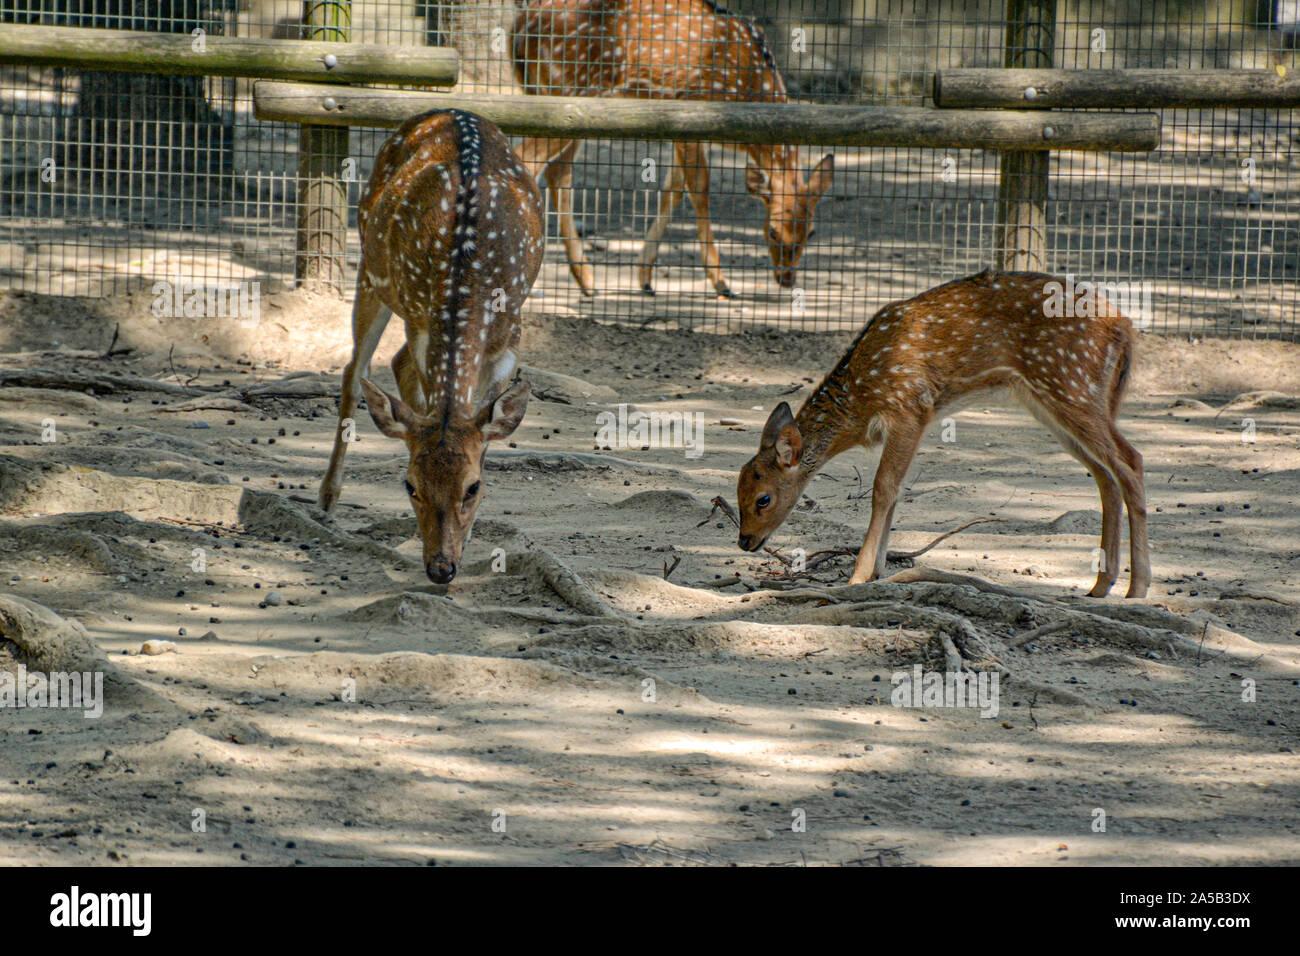 Rehe/deer im Zoo Punta Verde en Lignano (Italien) / Tierpark en Lignano / Sehenswürdigkeit en Lignano (Italien) Foto de stock